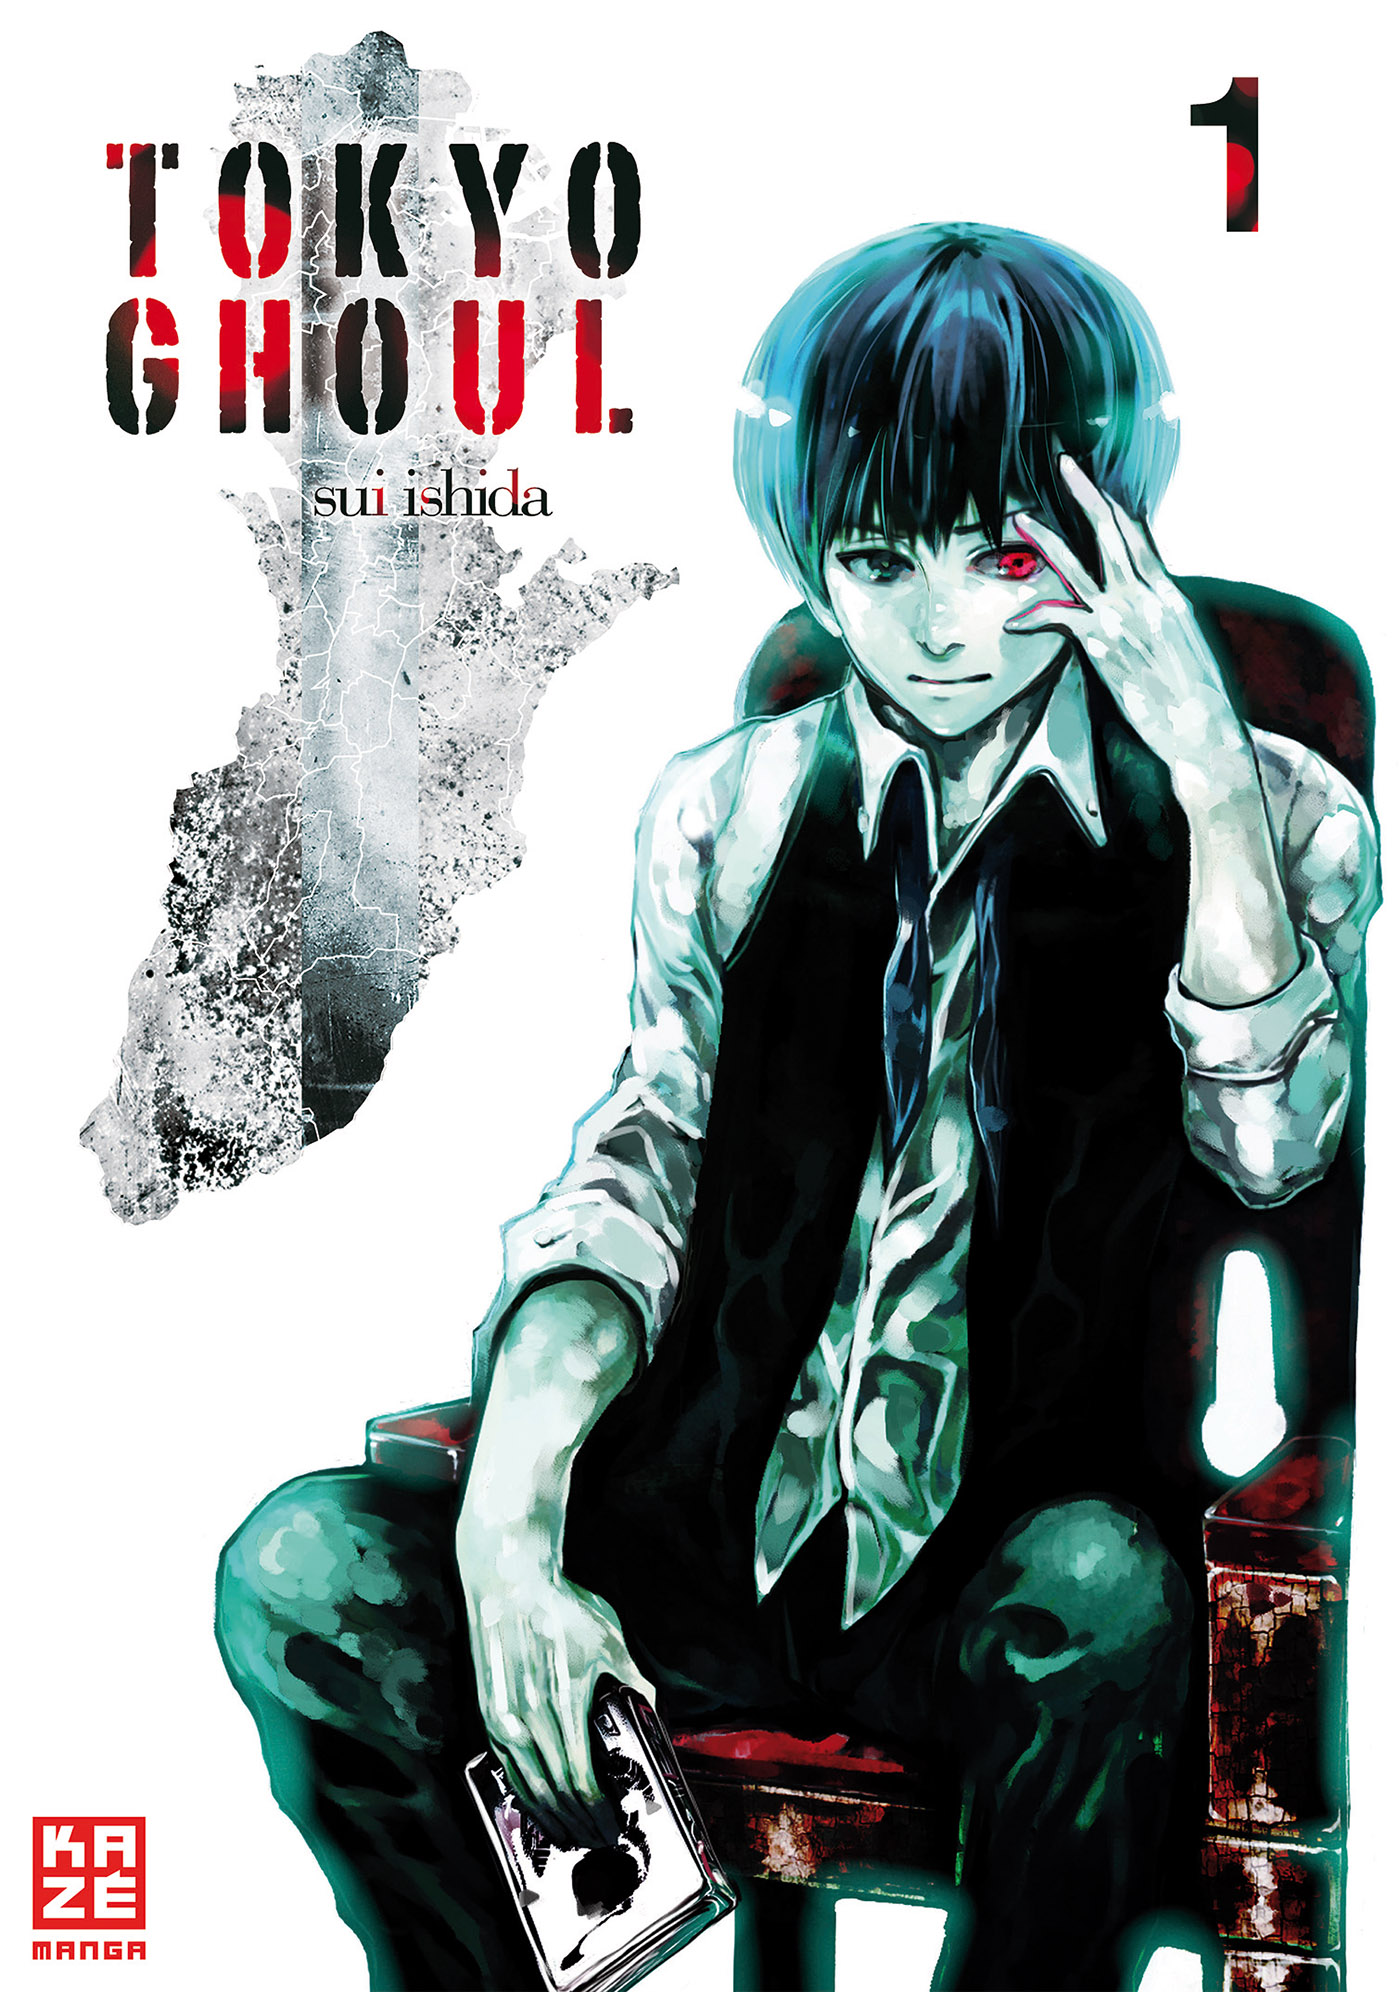 Tokyo Ghoul 01 - Ishida, Sui